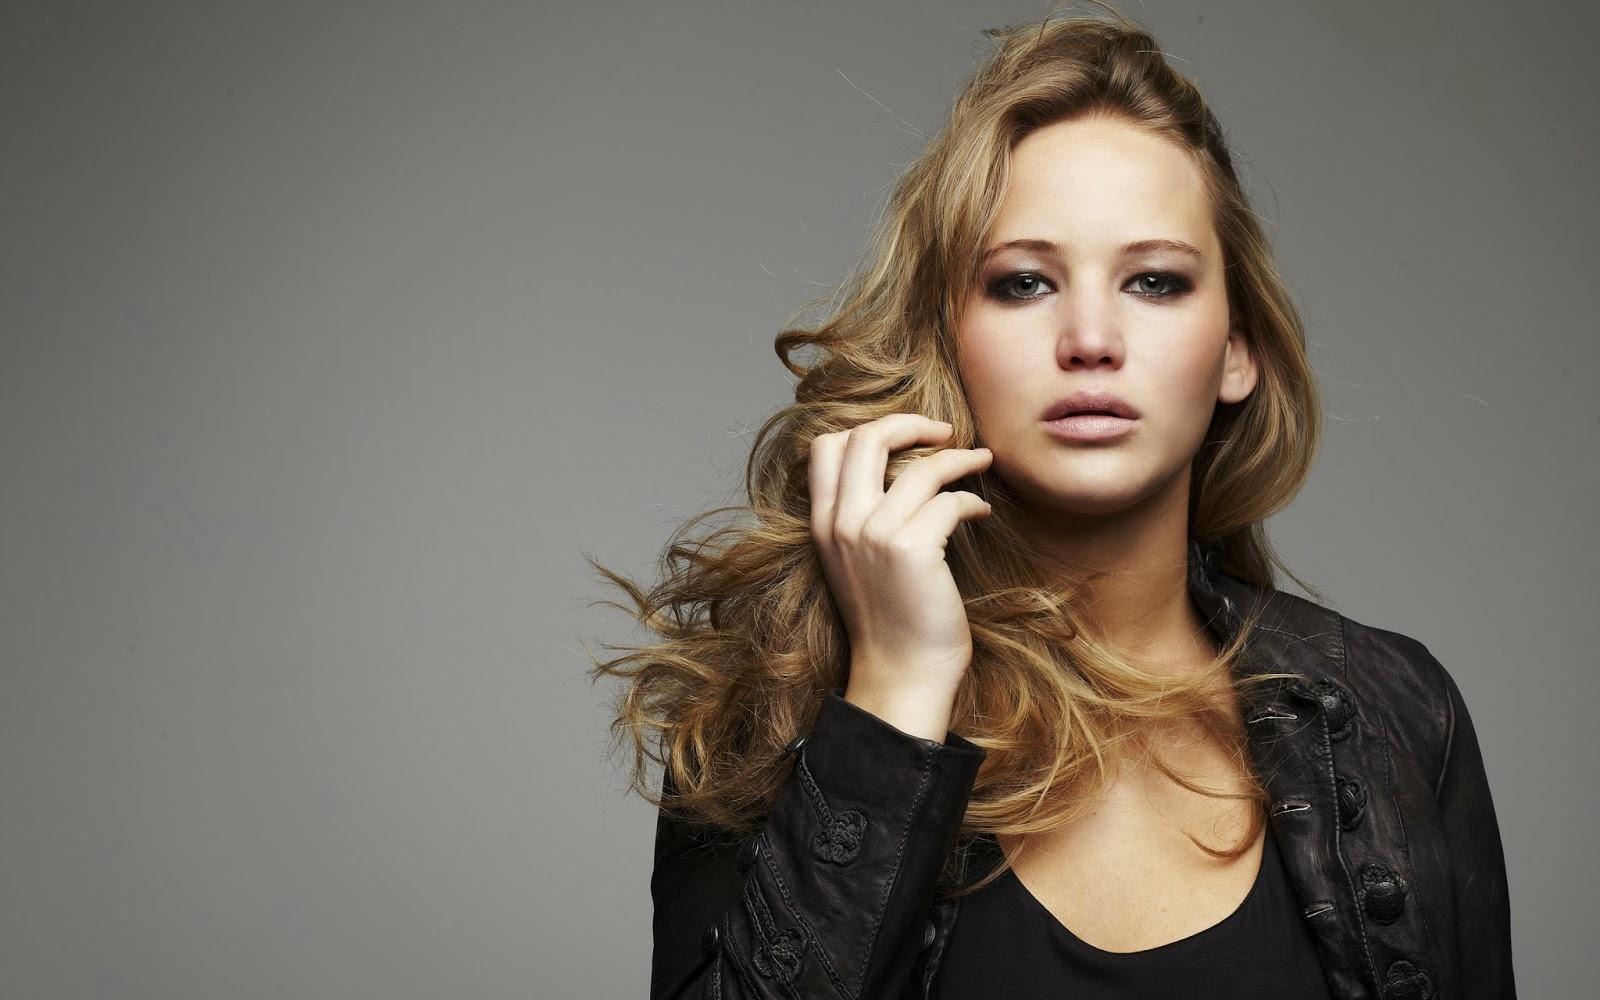 Celebrity HD Wallpapers: Jennifer Lawrence Hot HD Images